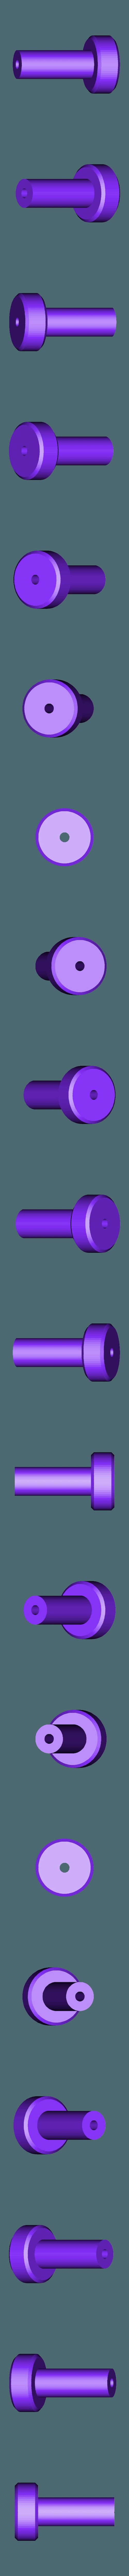 Nose_Block_Plug.stl Download free STL file Flyer Mk. 1 • 3D printing object, billbo1958